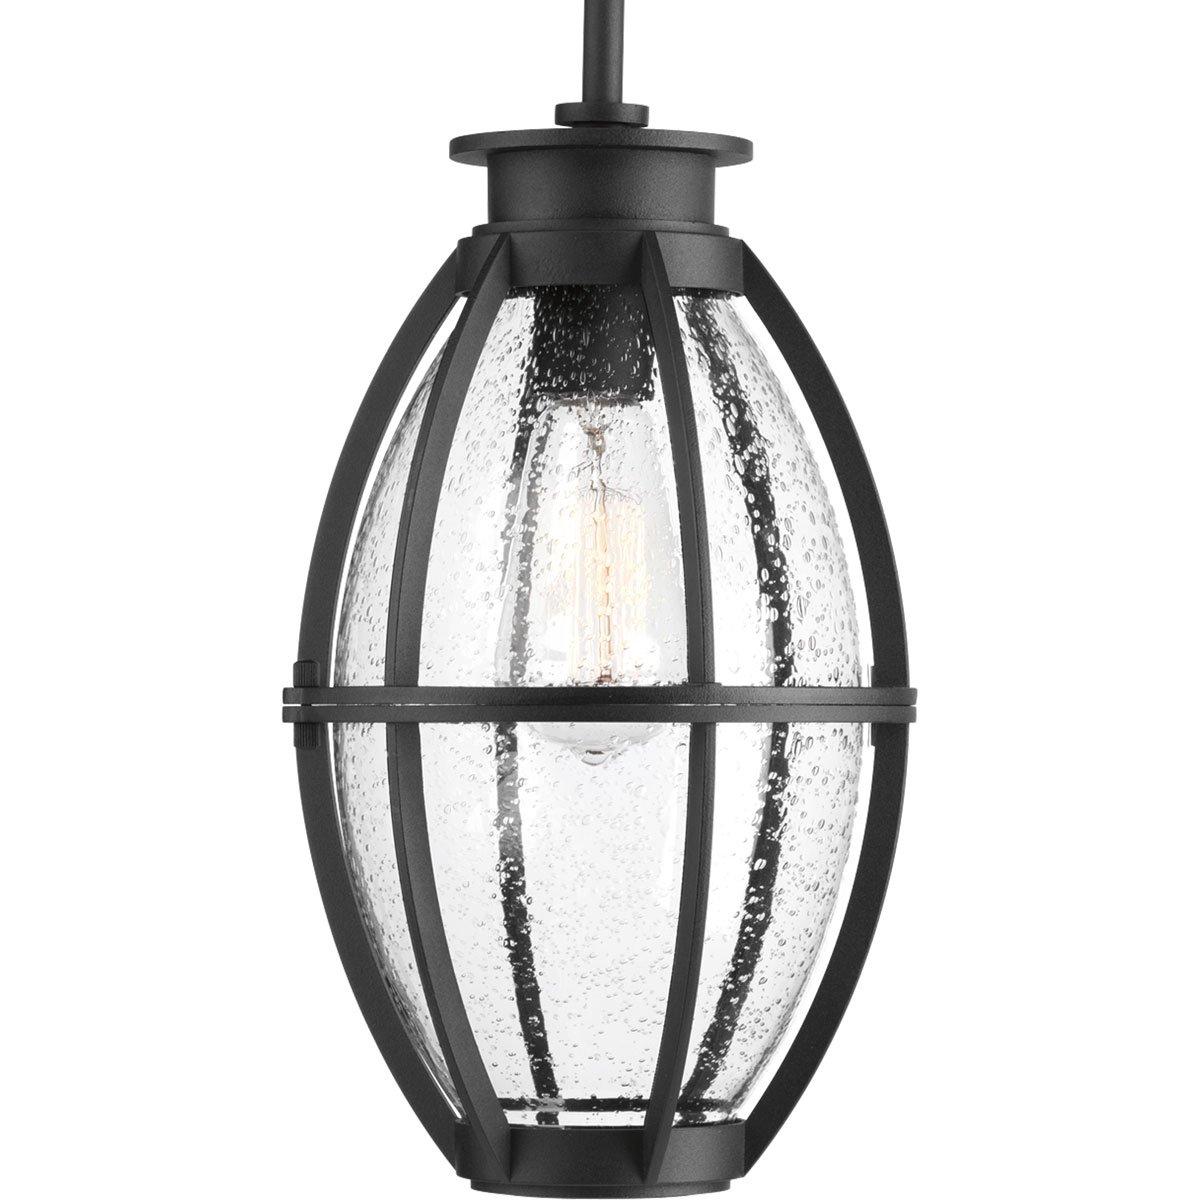 Progress Lighting P550005-031 Pier 33 One-Light Hanging Lantern Black